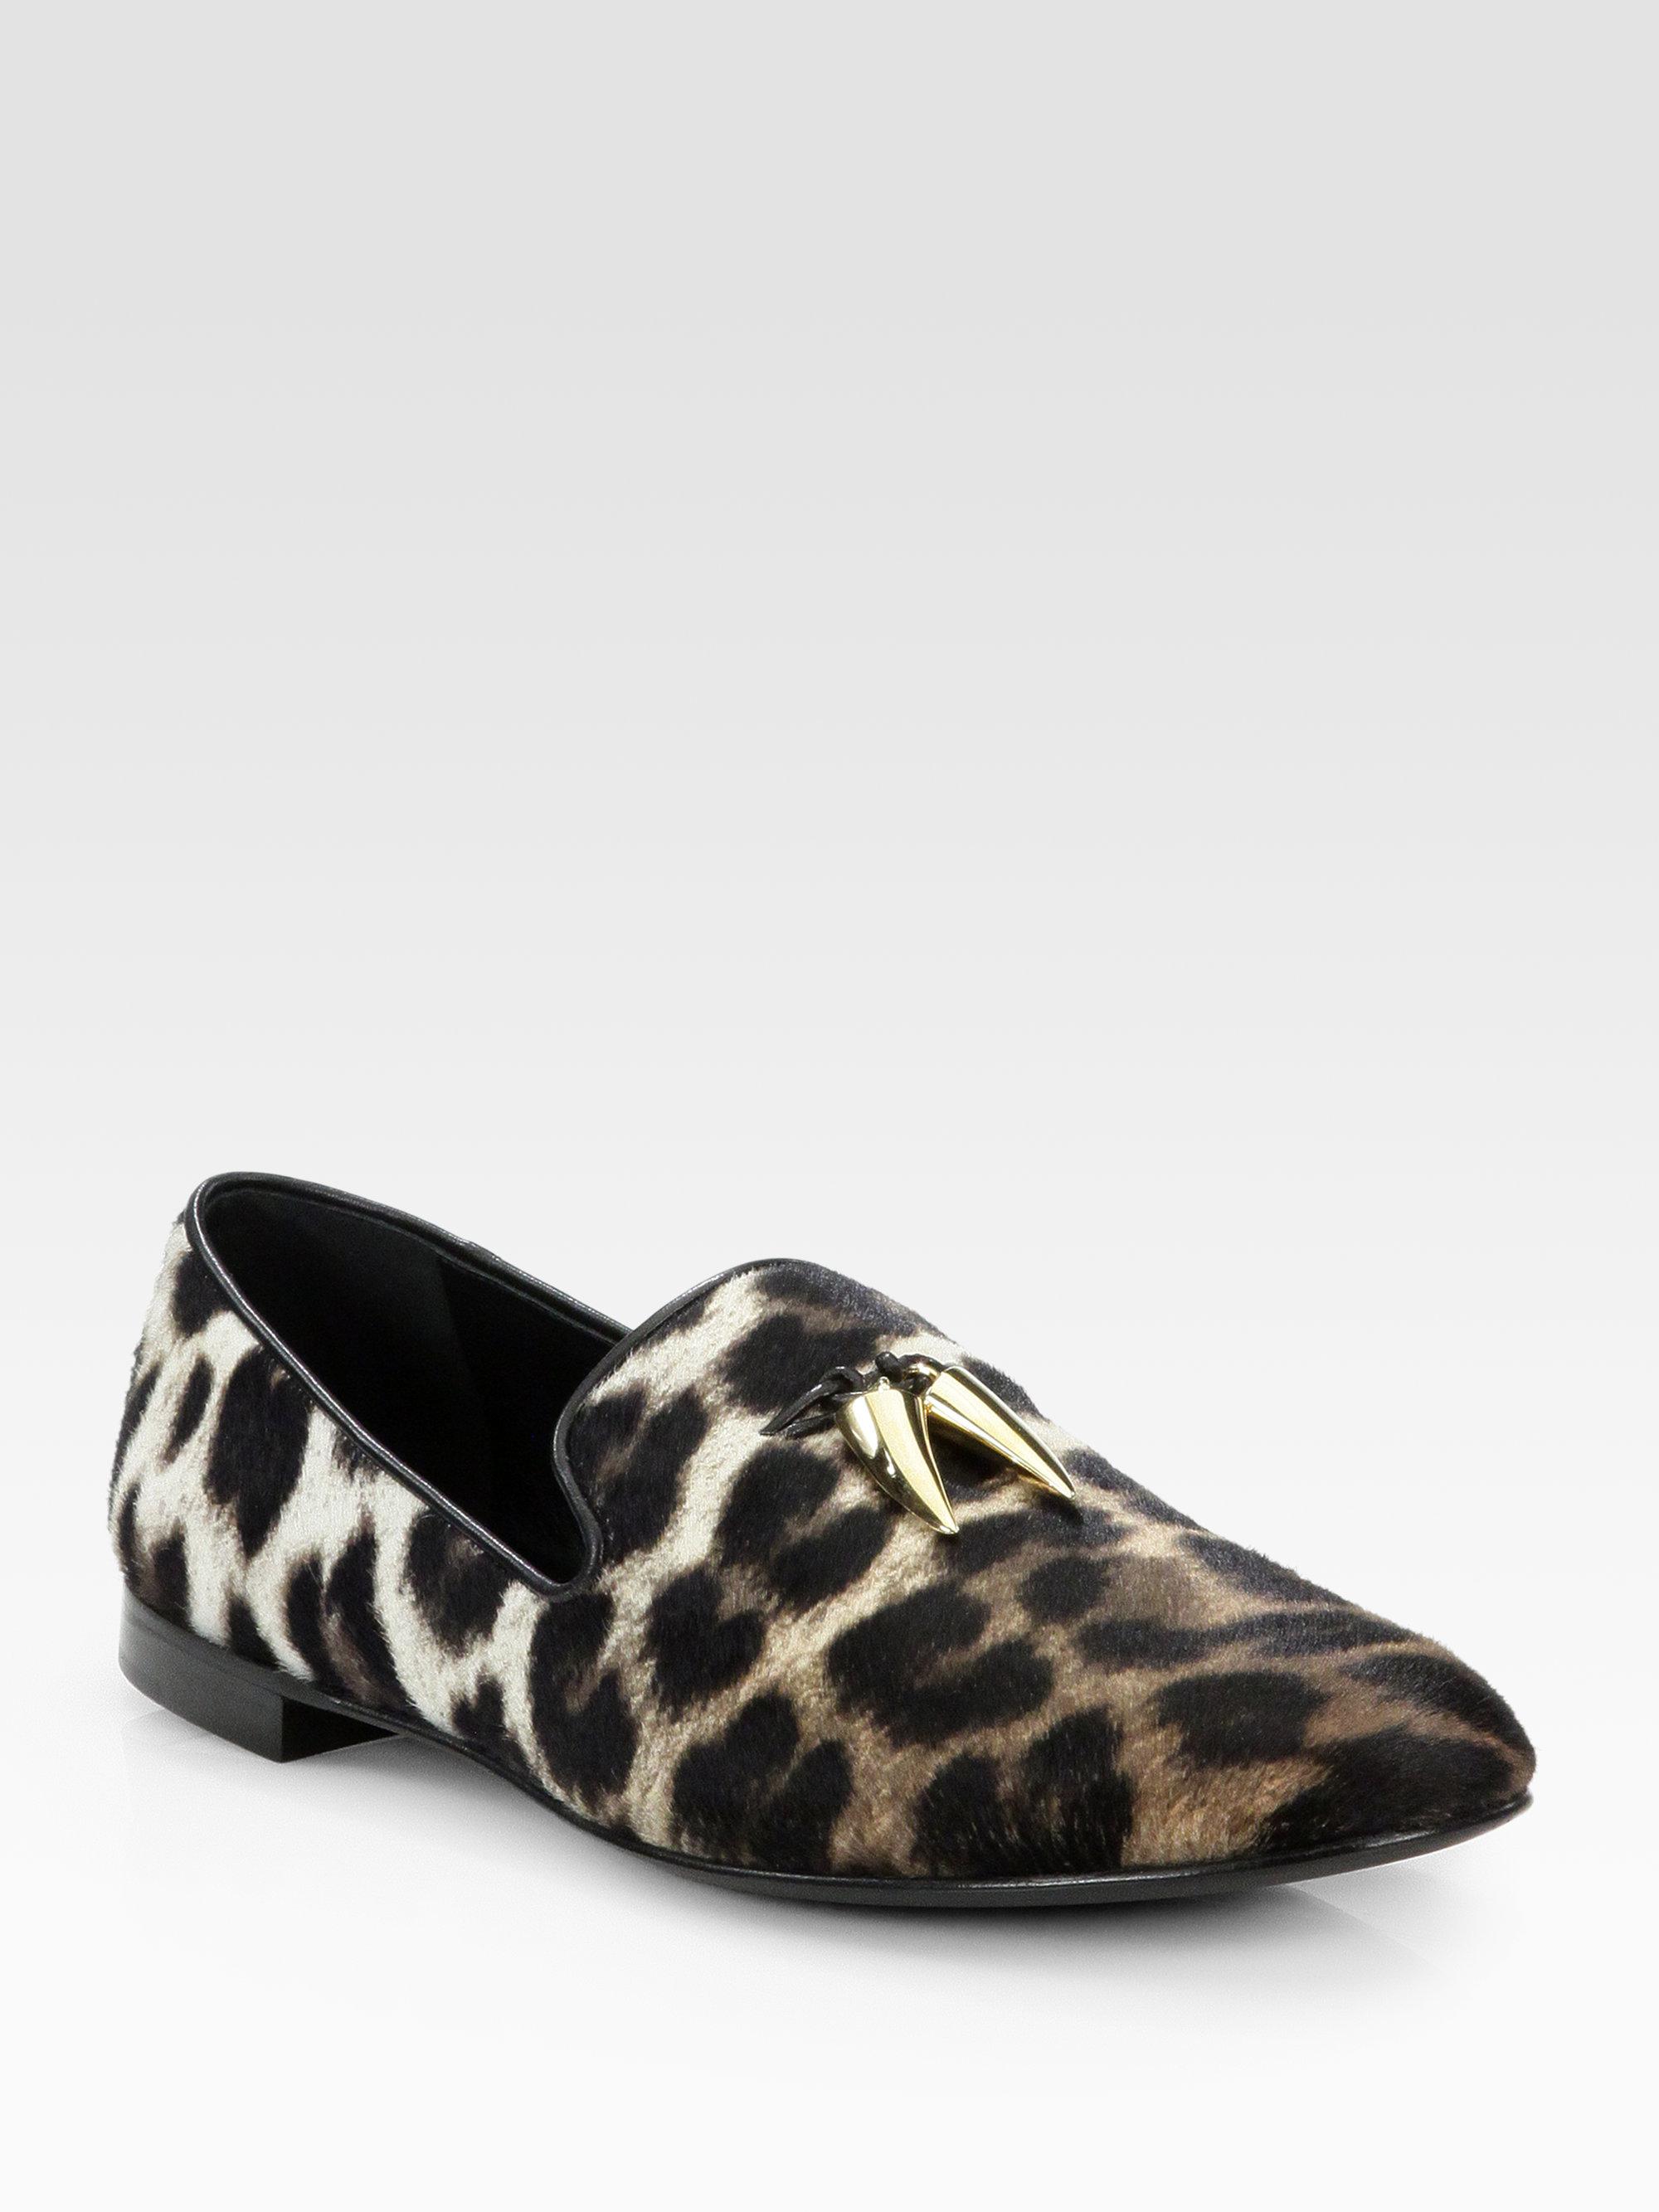 Giuseppe Zanotti Naomi Animal Smoking Slippers In Black Lyst